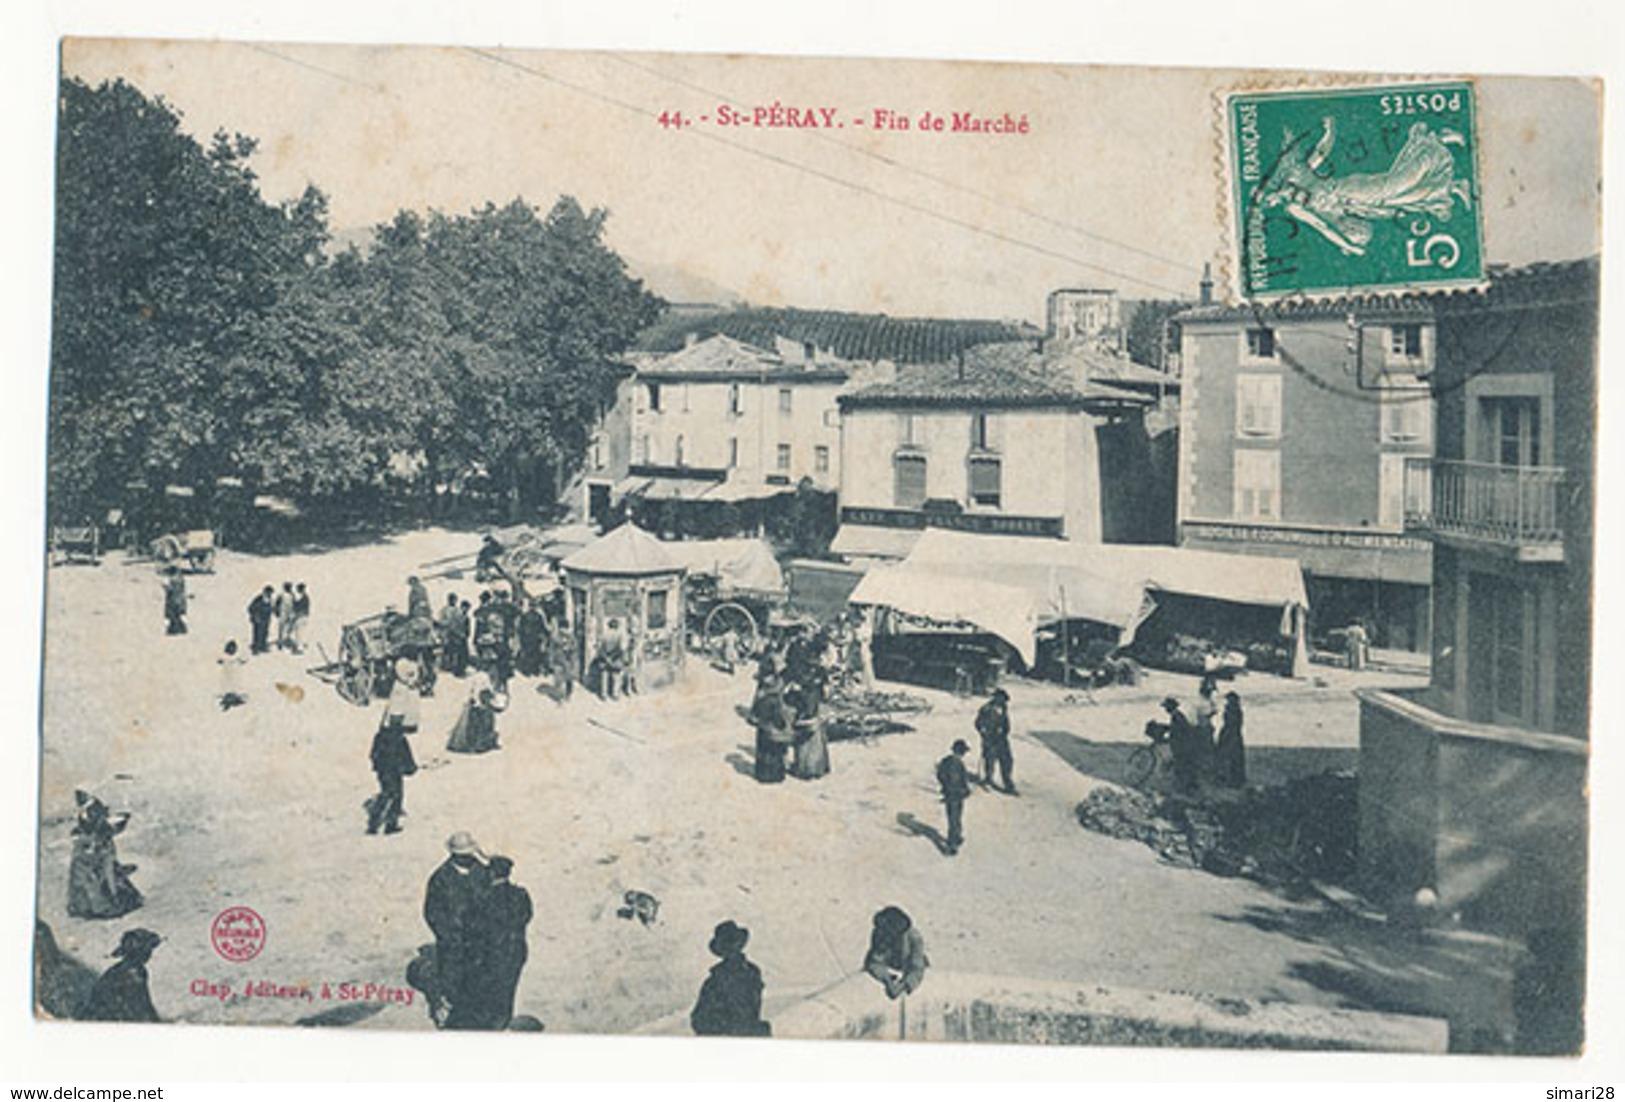 ST PERAY - N° 44 - FIN DE MARCHE - Saint Péray